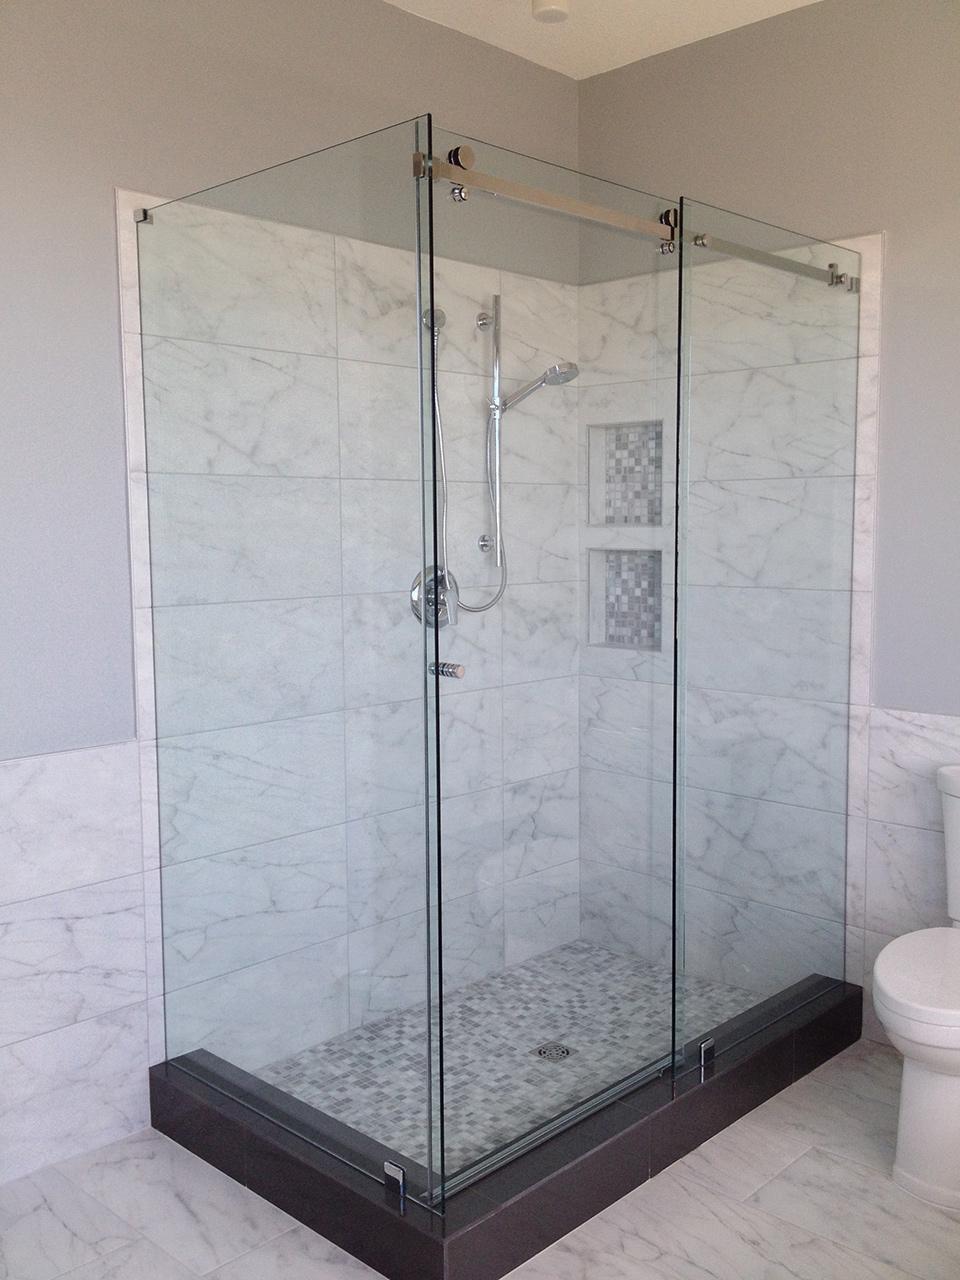 Funky Double Shower Doors Crest Bathtub Ideas